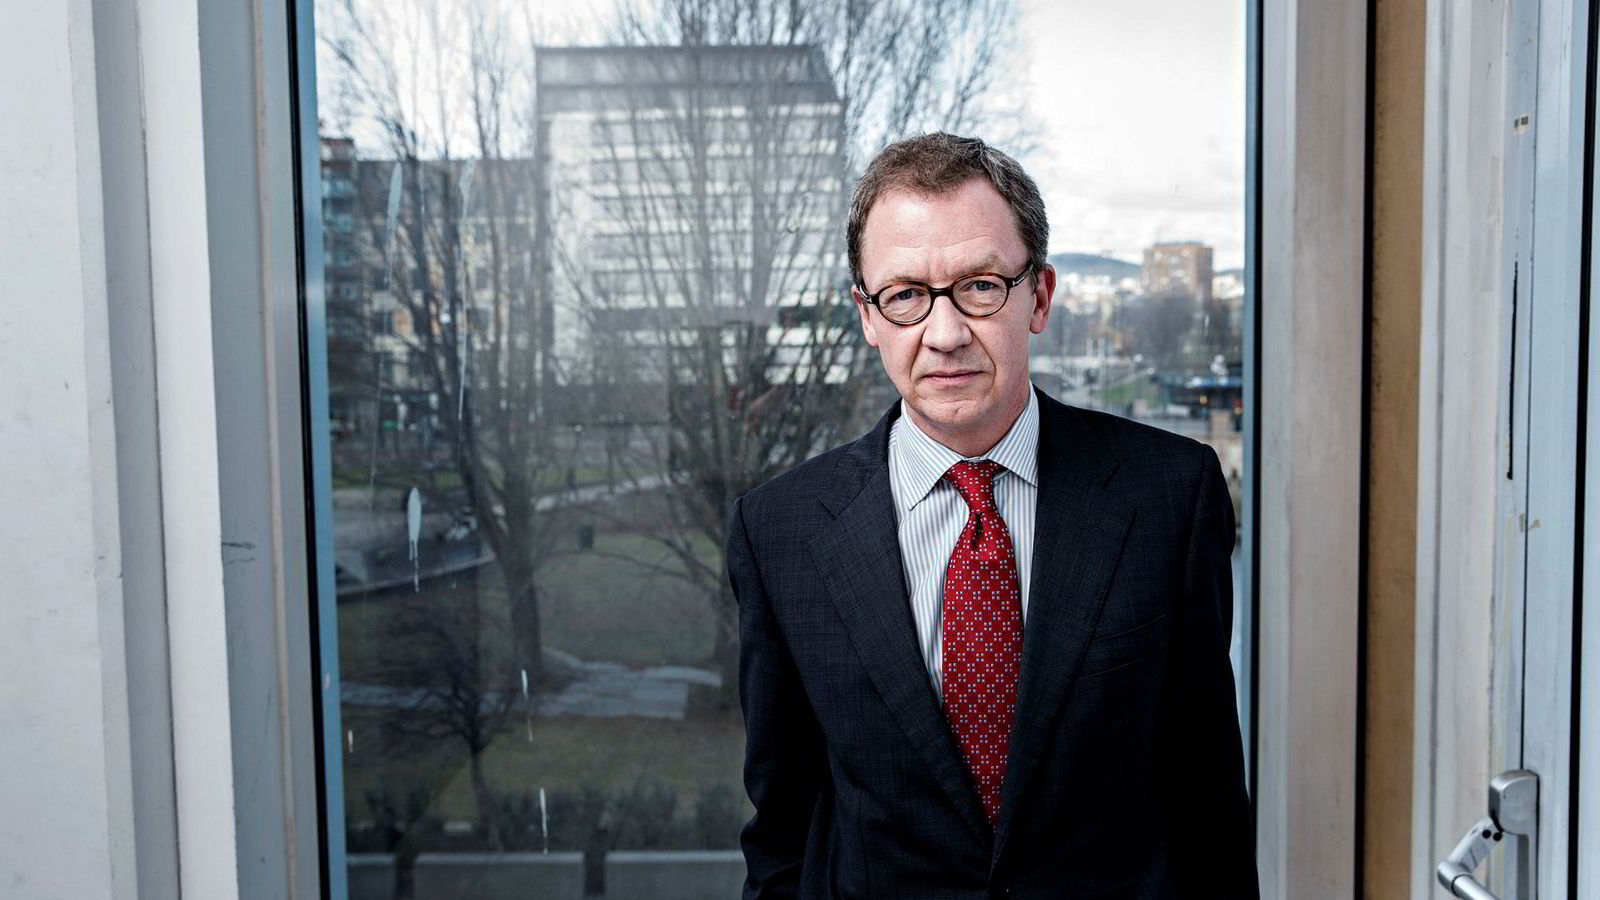 – Tallene tyder på at husholdningene opplever en god utvikling i egen og landets økonomi, og at de har kontroll på privatøkonomien, sier administrerende direktør Idar Kreutzer i Finans Norge i en pressemelding.